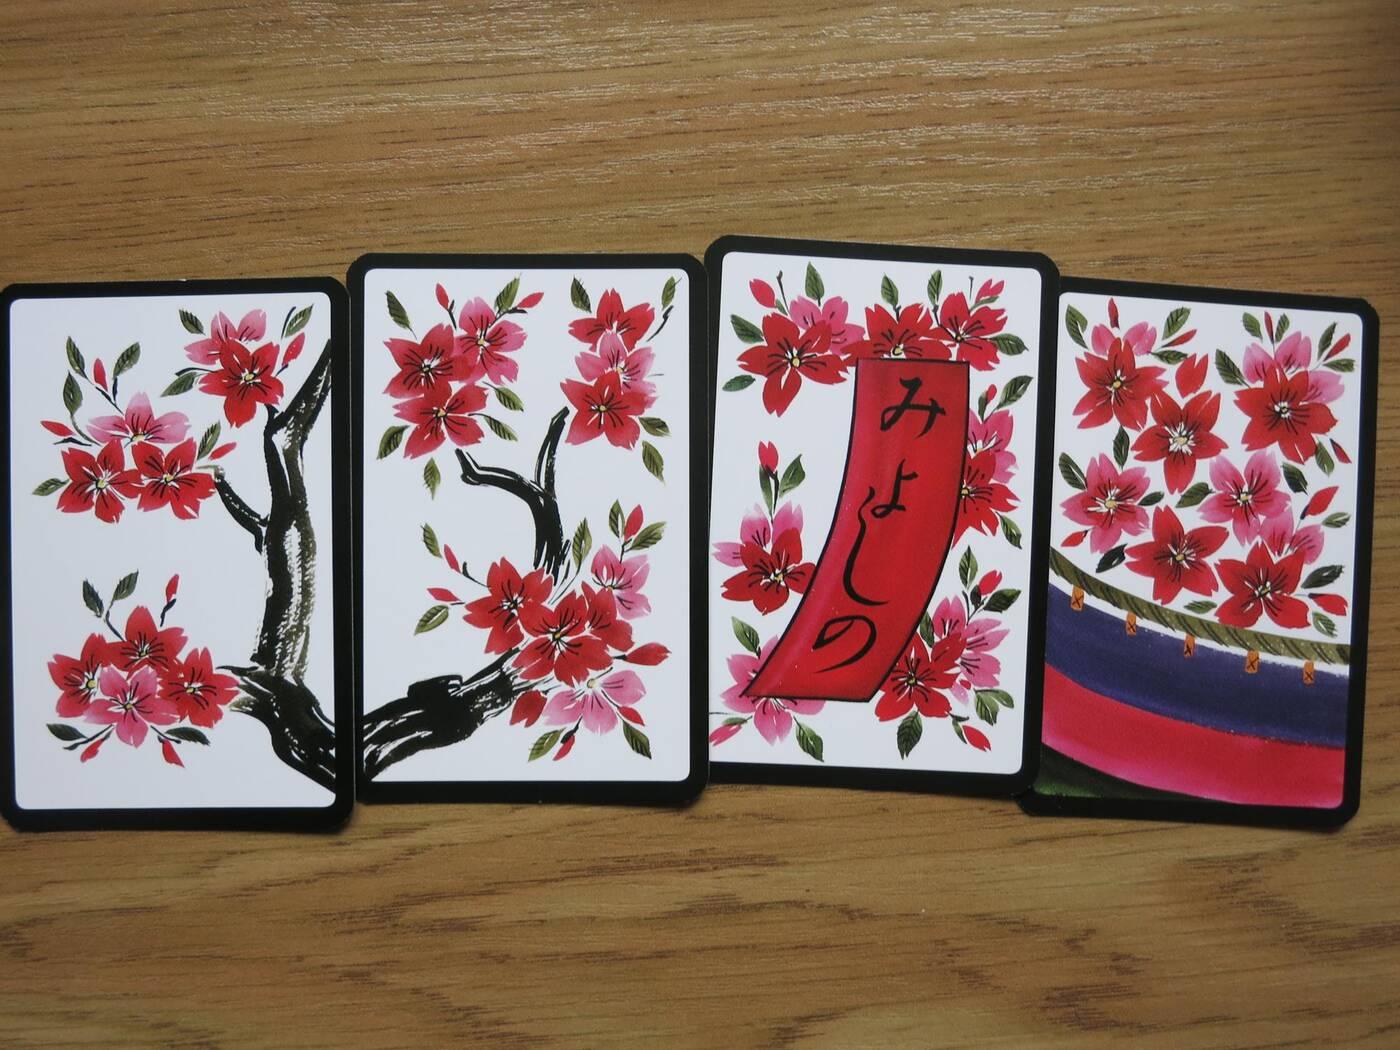 Hanafuda karty